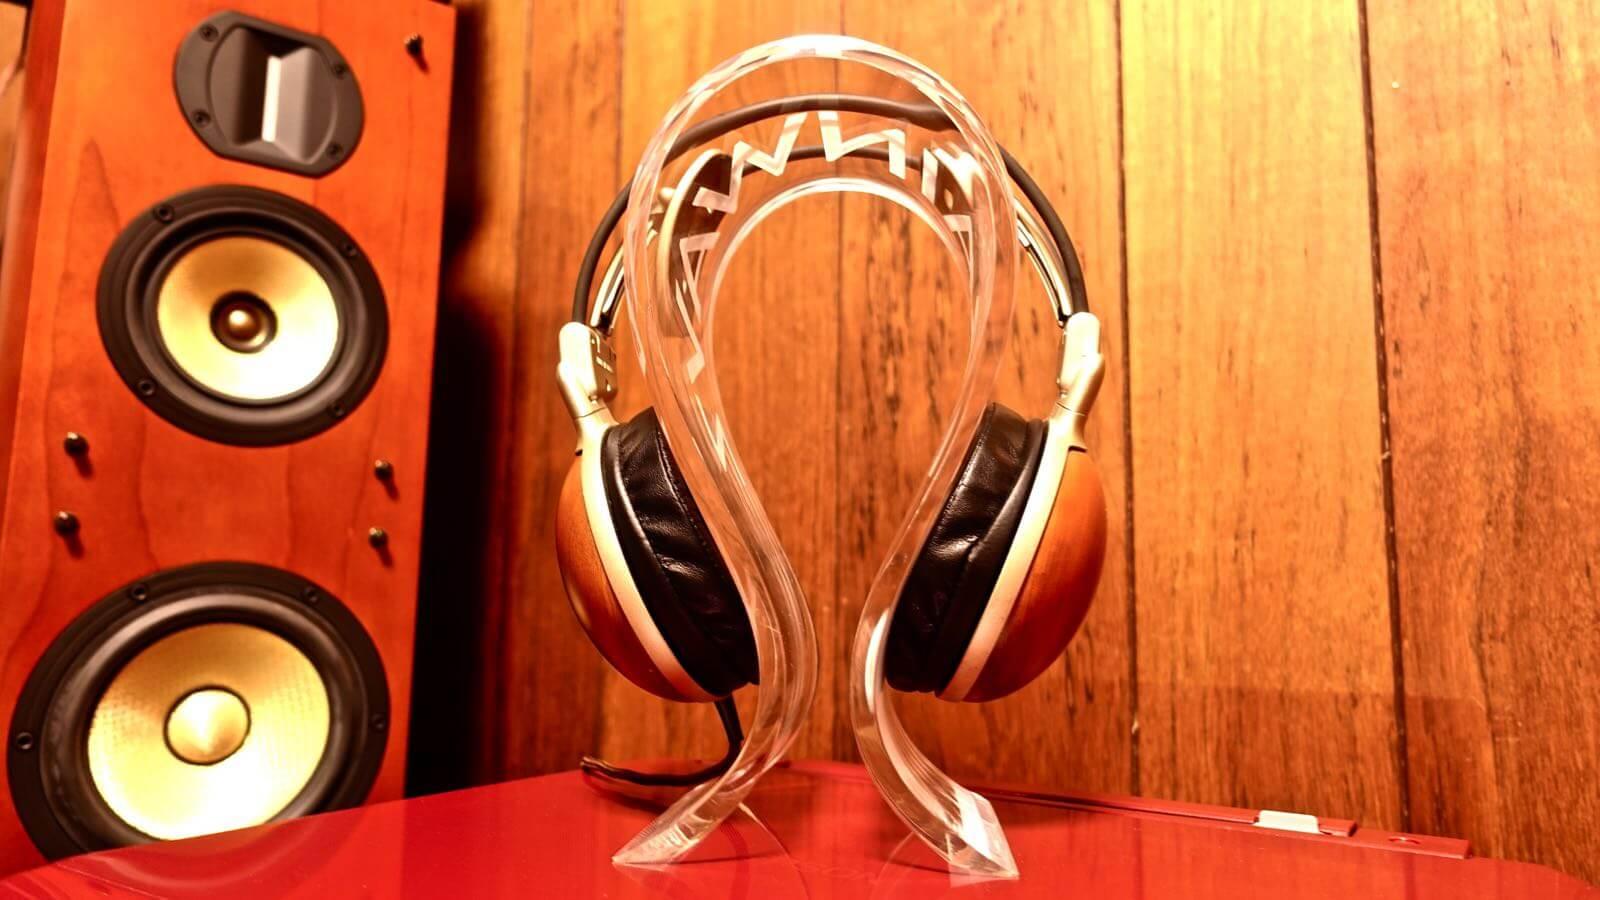 0080 OMEGA type headphone stand BRAINWAVZ review 08